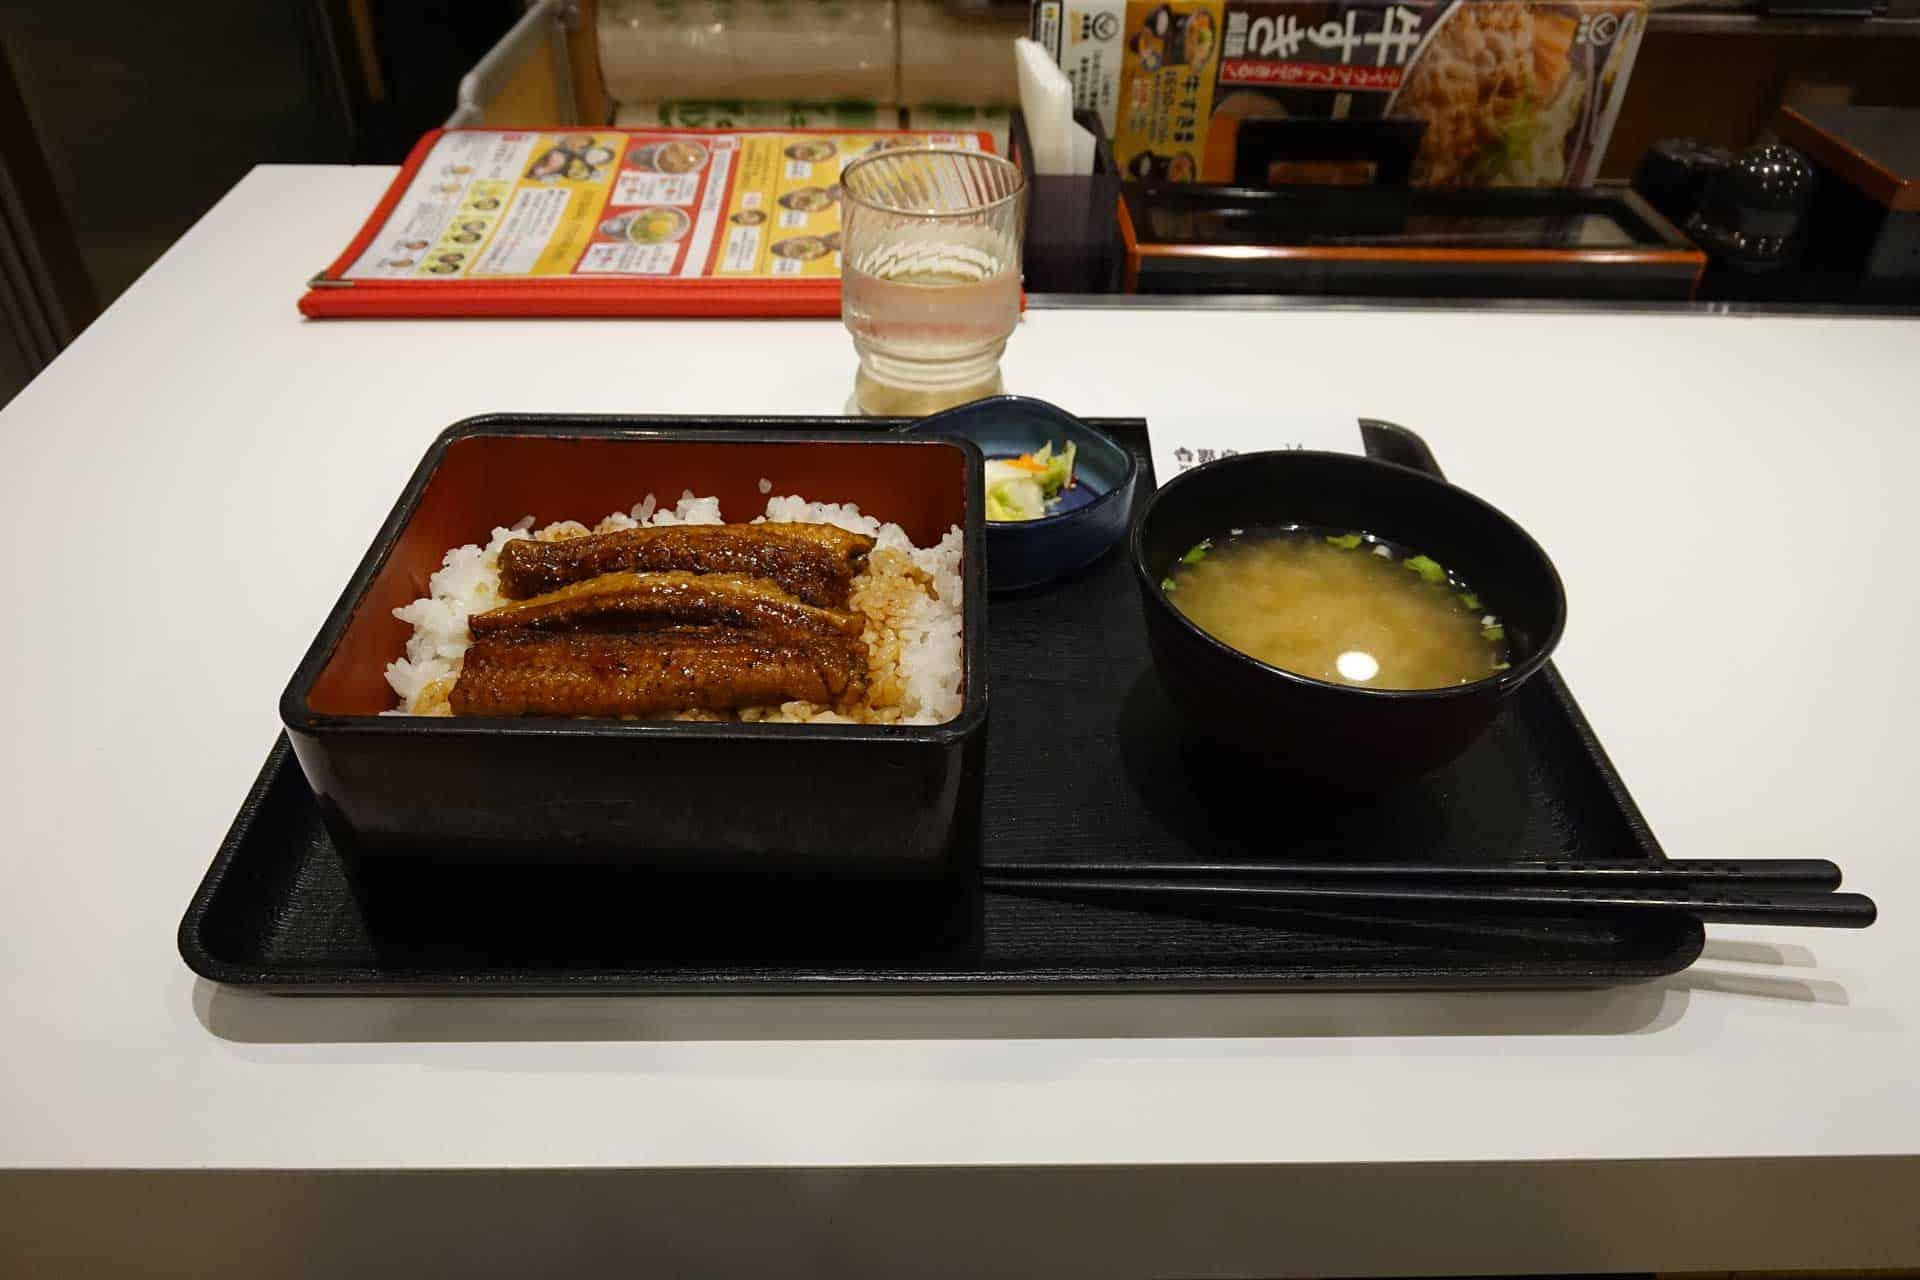 Seeking Spice in Japan 16: Yoshinoya at the Airport for Unagi